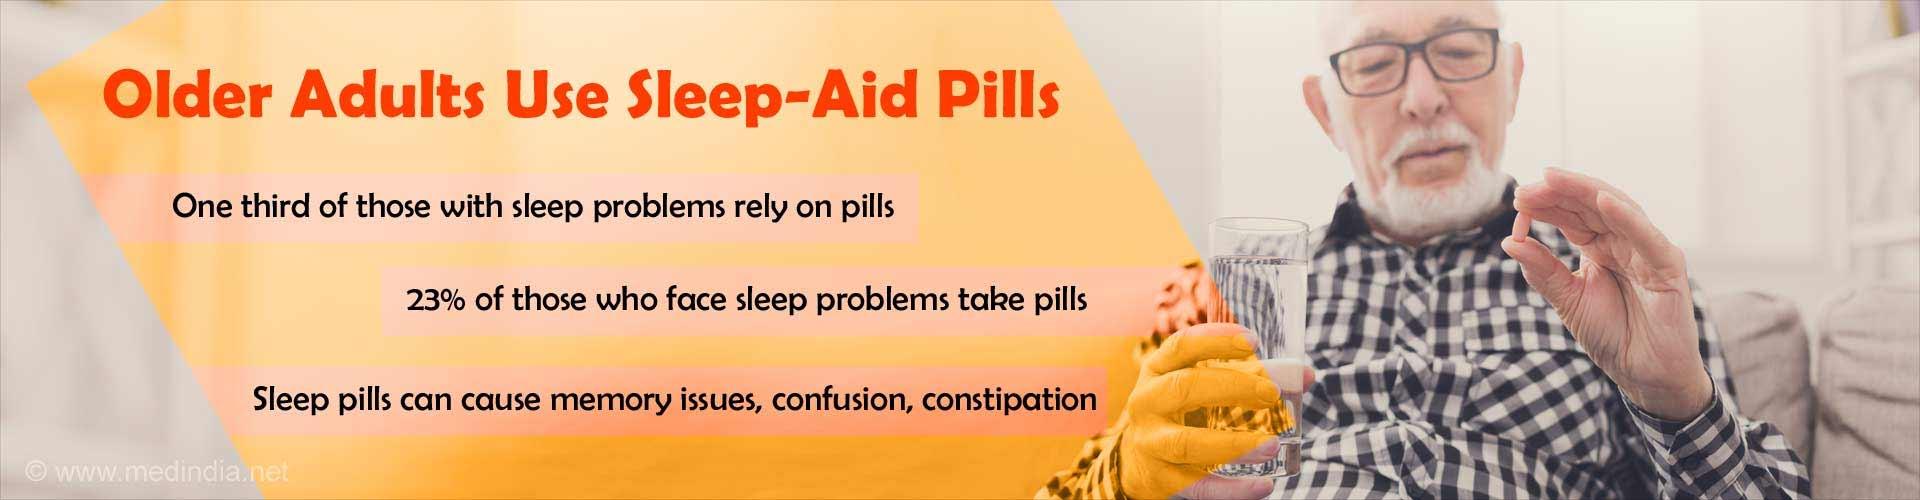 Sleep Pills in Old Age Can Hamper Health